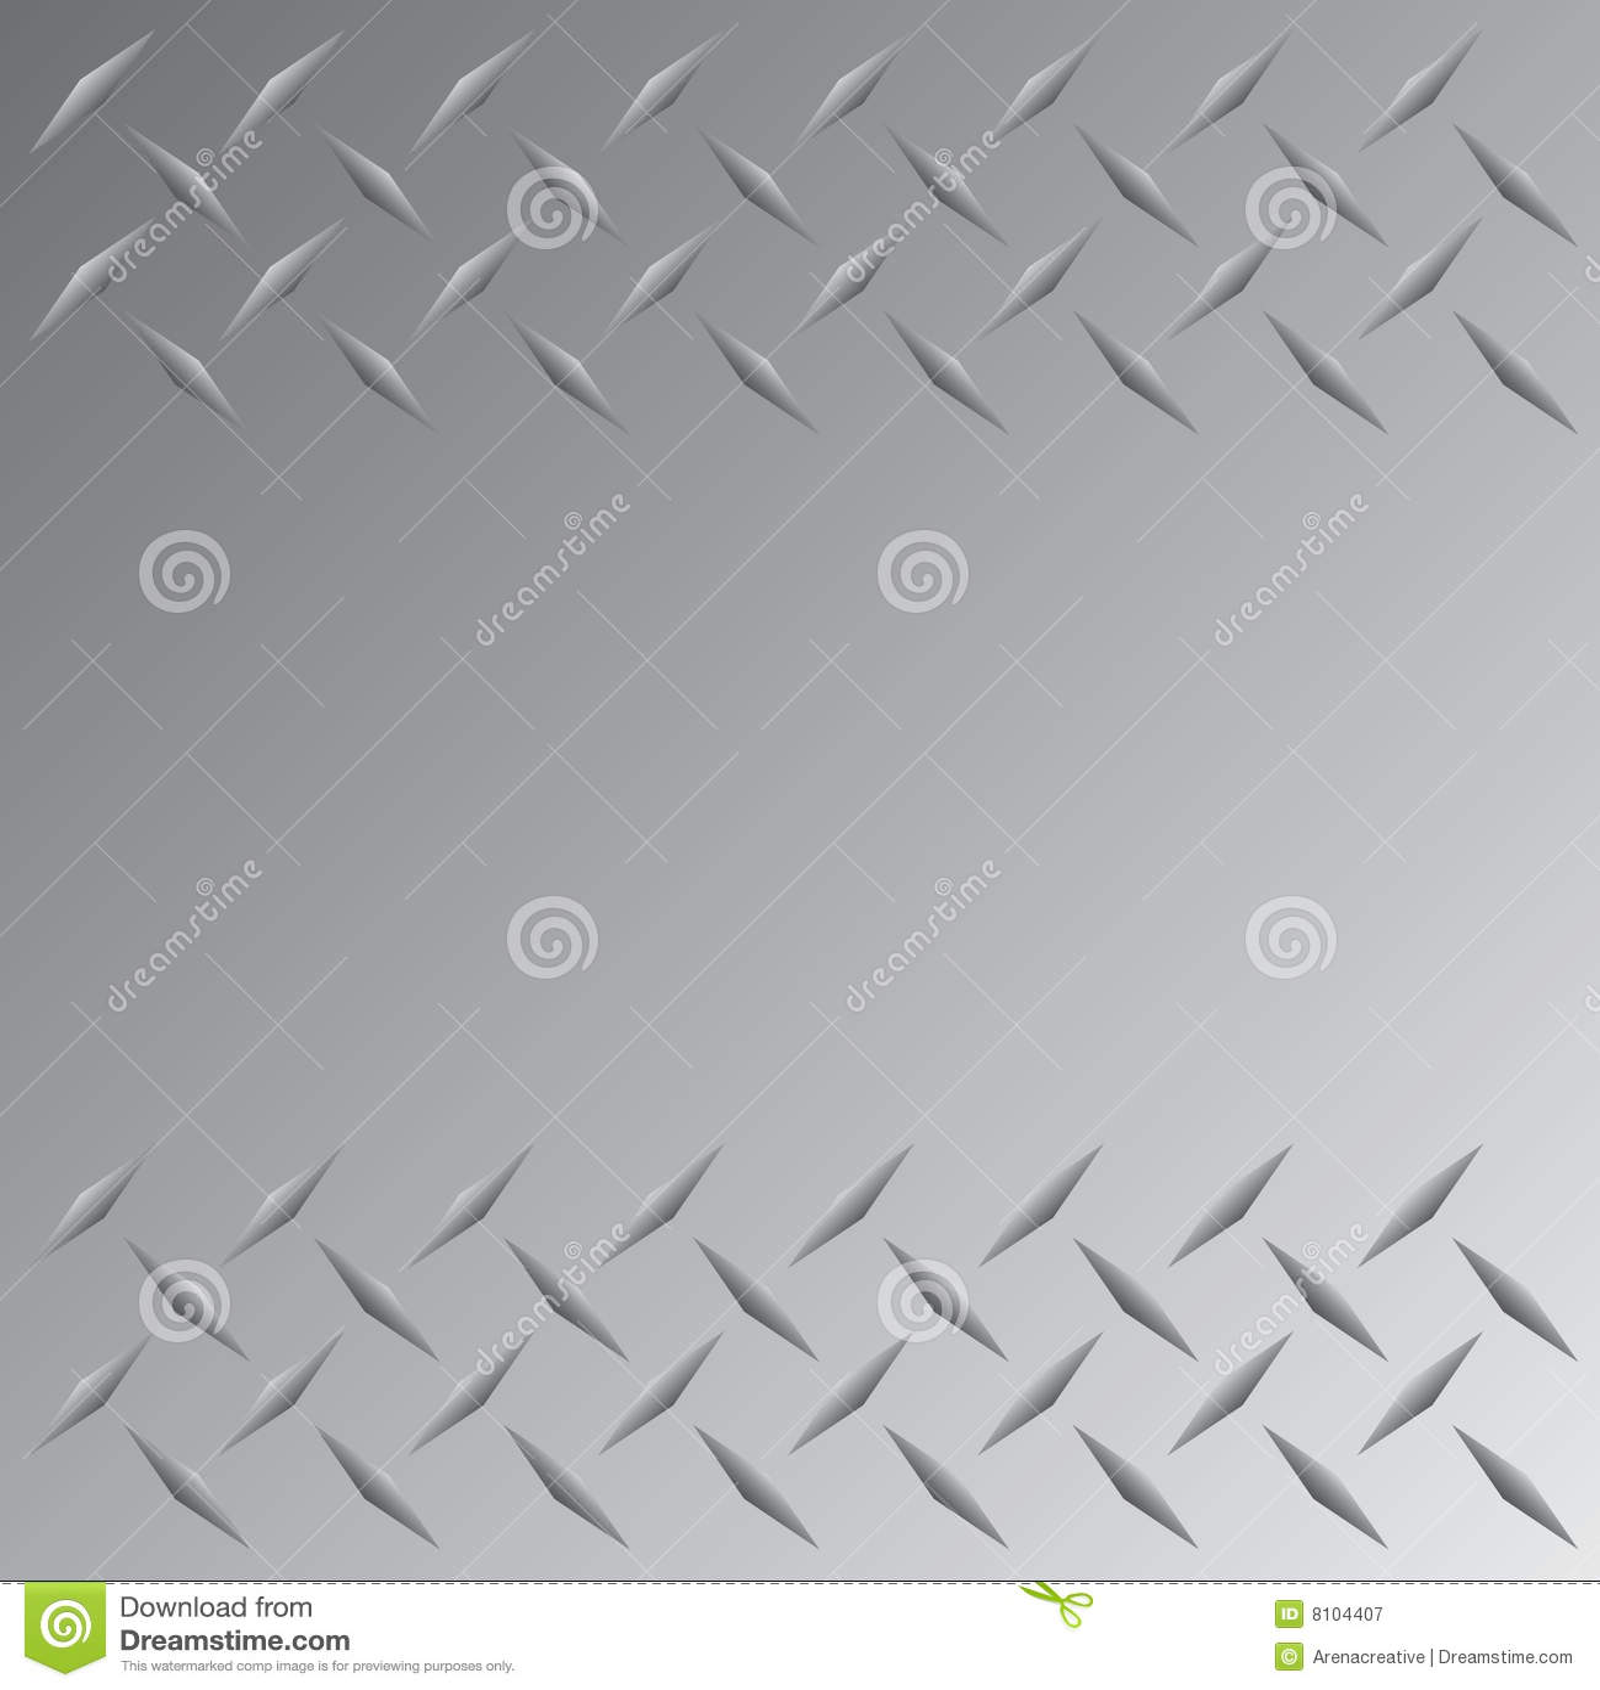 diamond plate metallic border - photo #6